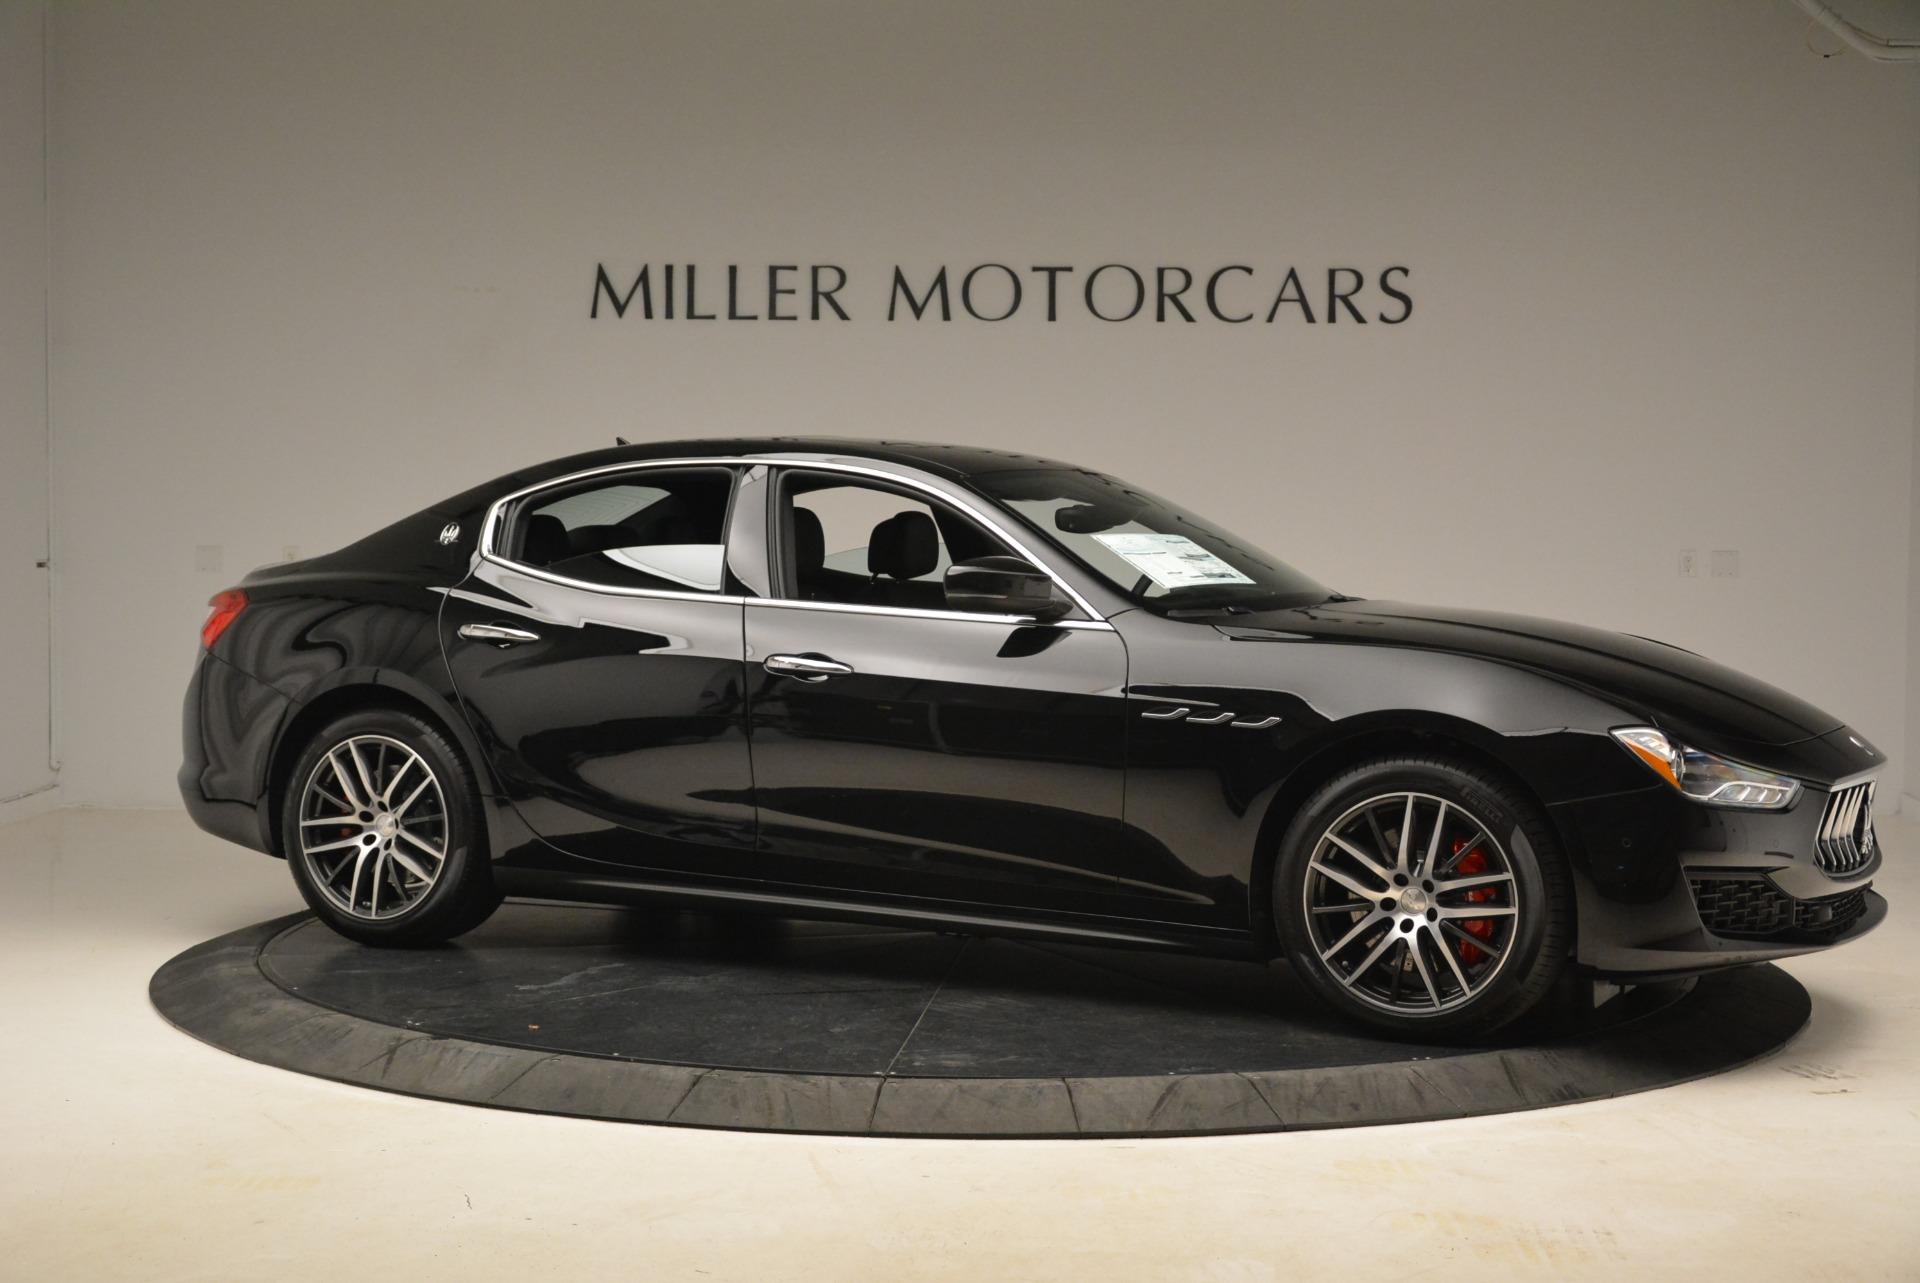 Used 2018 Maserati Ghibli S Q4 For Sale In Greenwich, CT 2271_p11